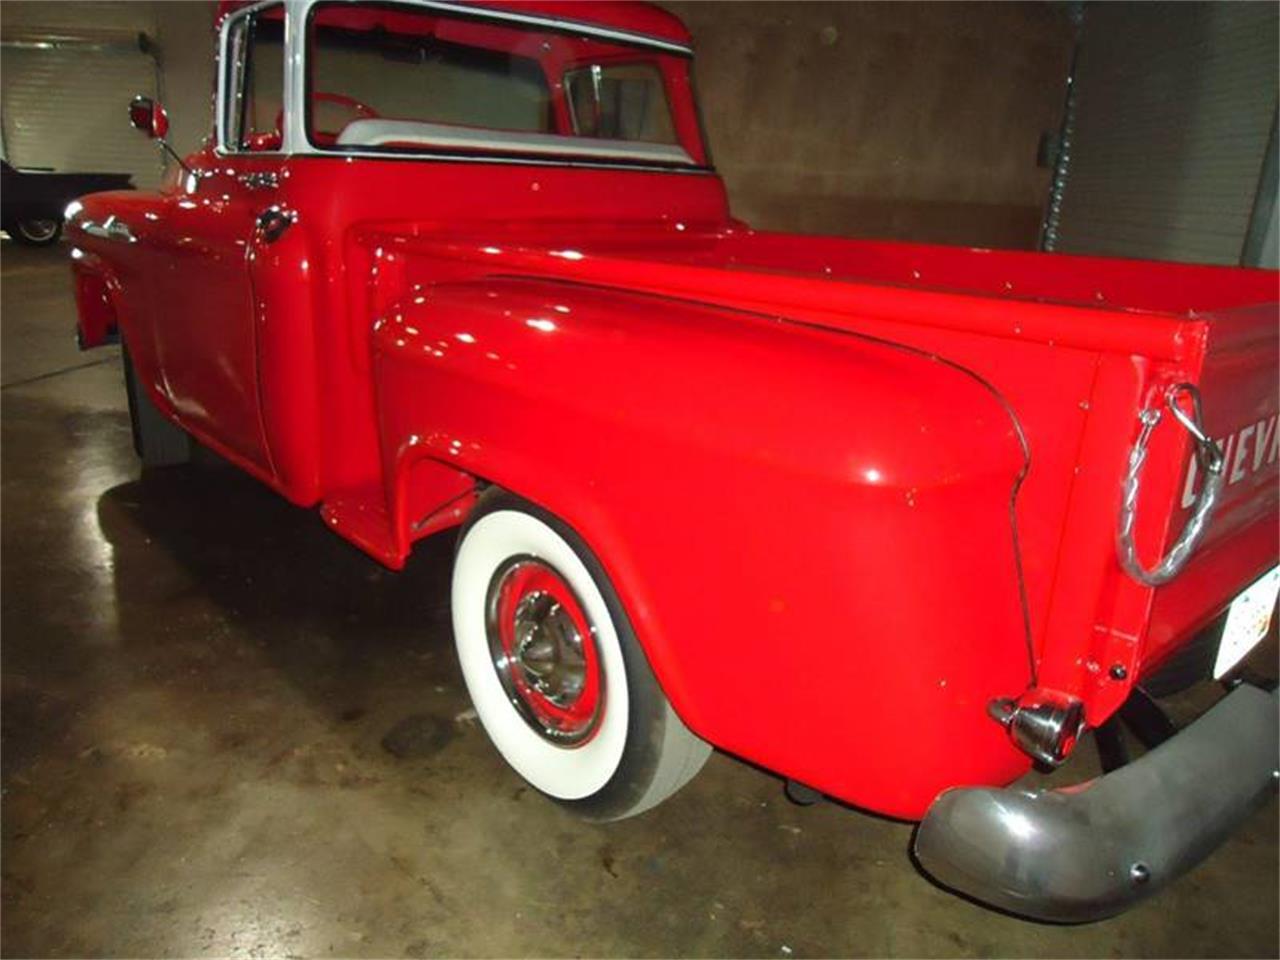 Cars For Sale Savannah Ga: 1958 Chevrolet Apache For Sale